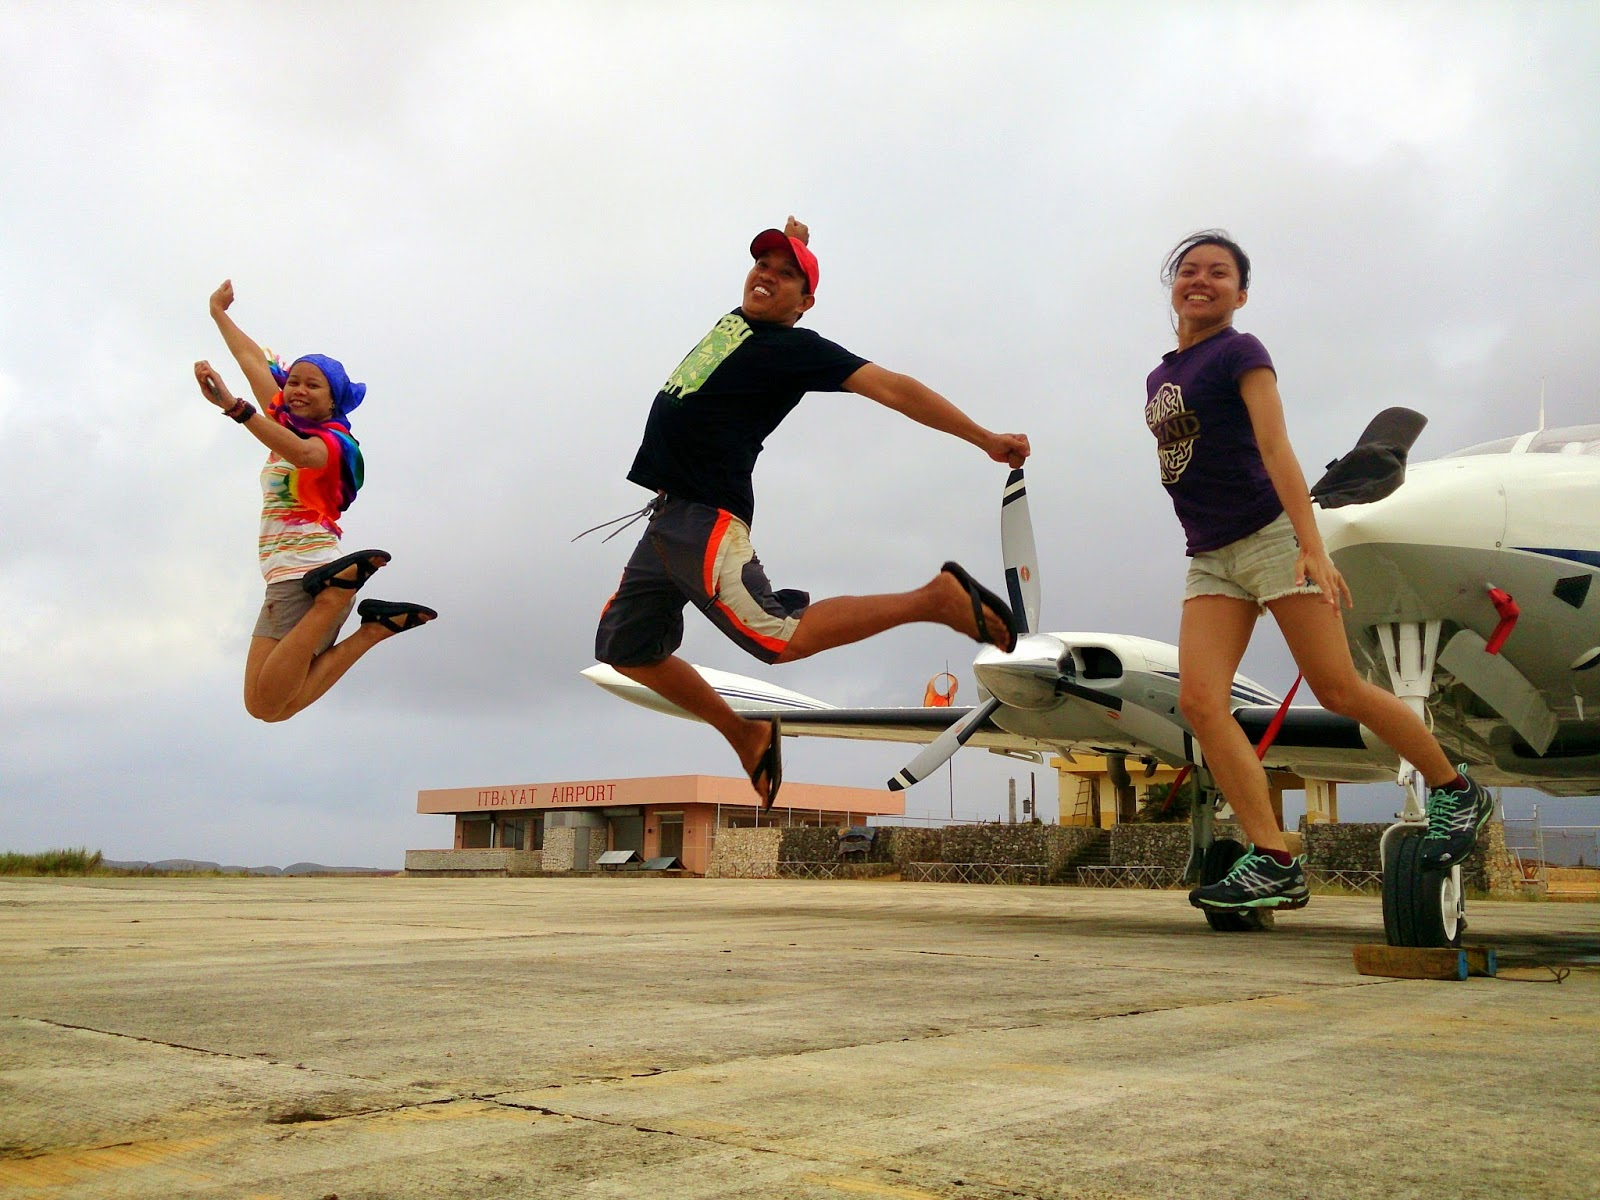 Itbayat Airport, Batanes